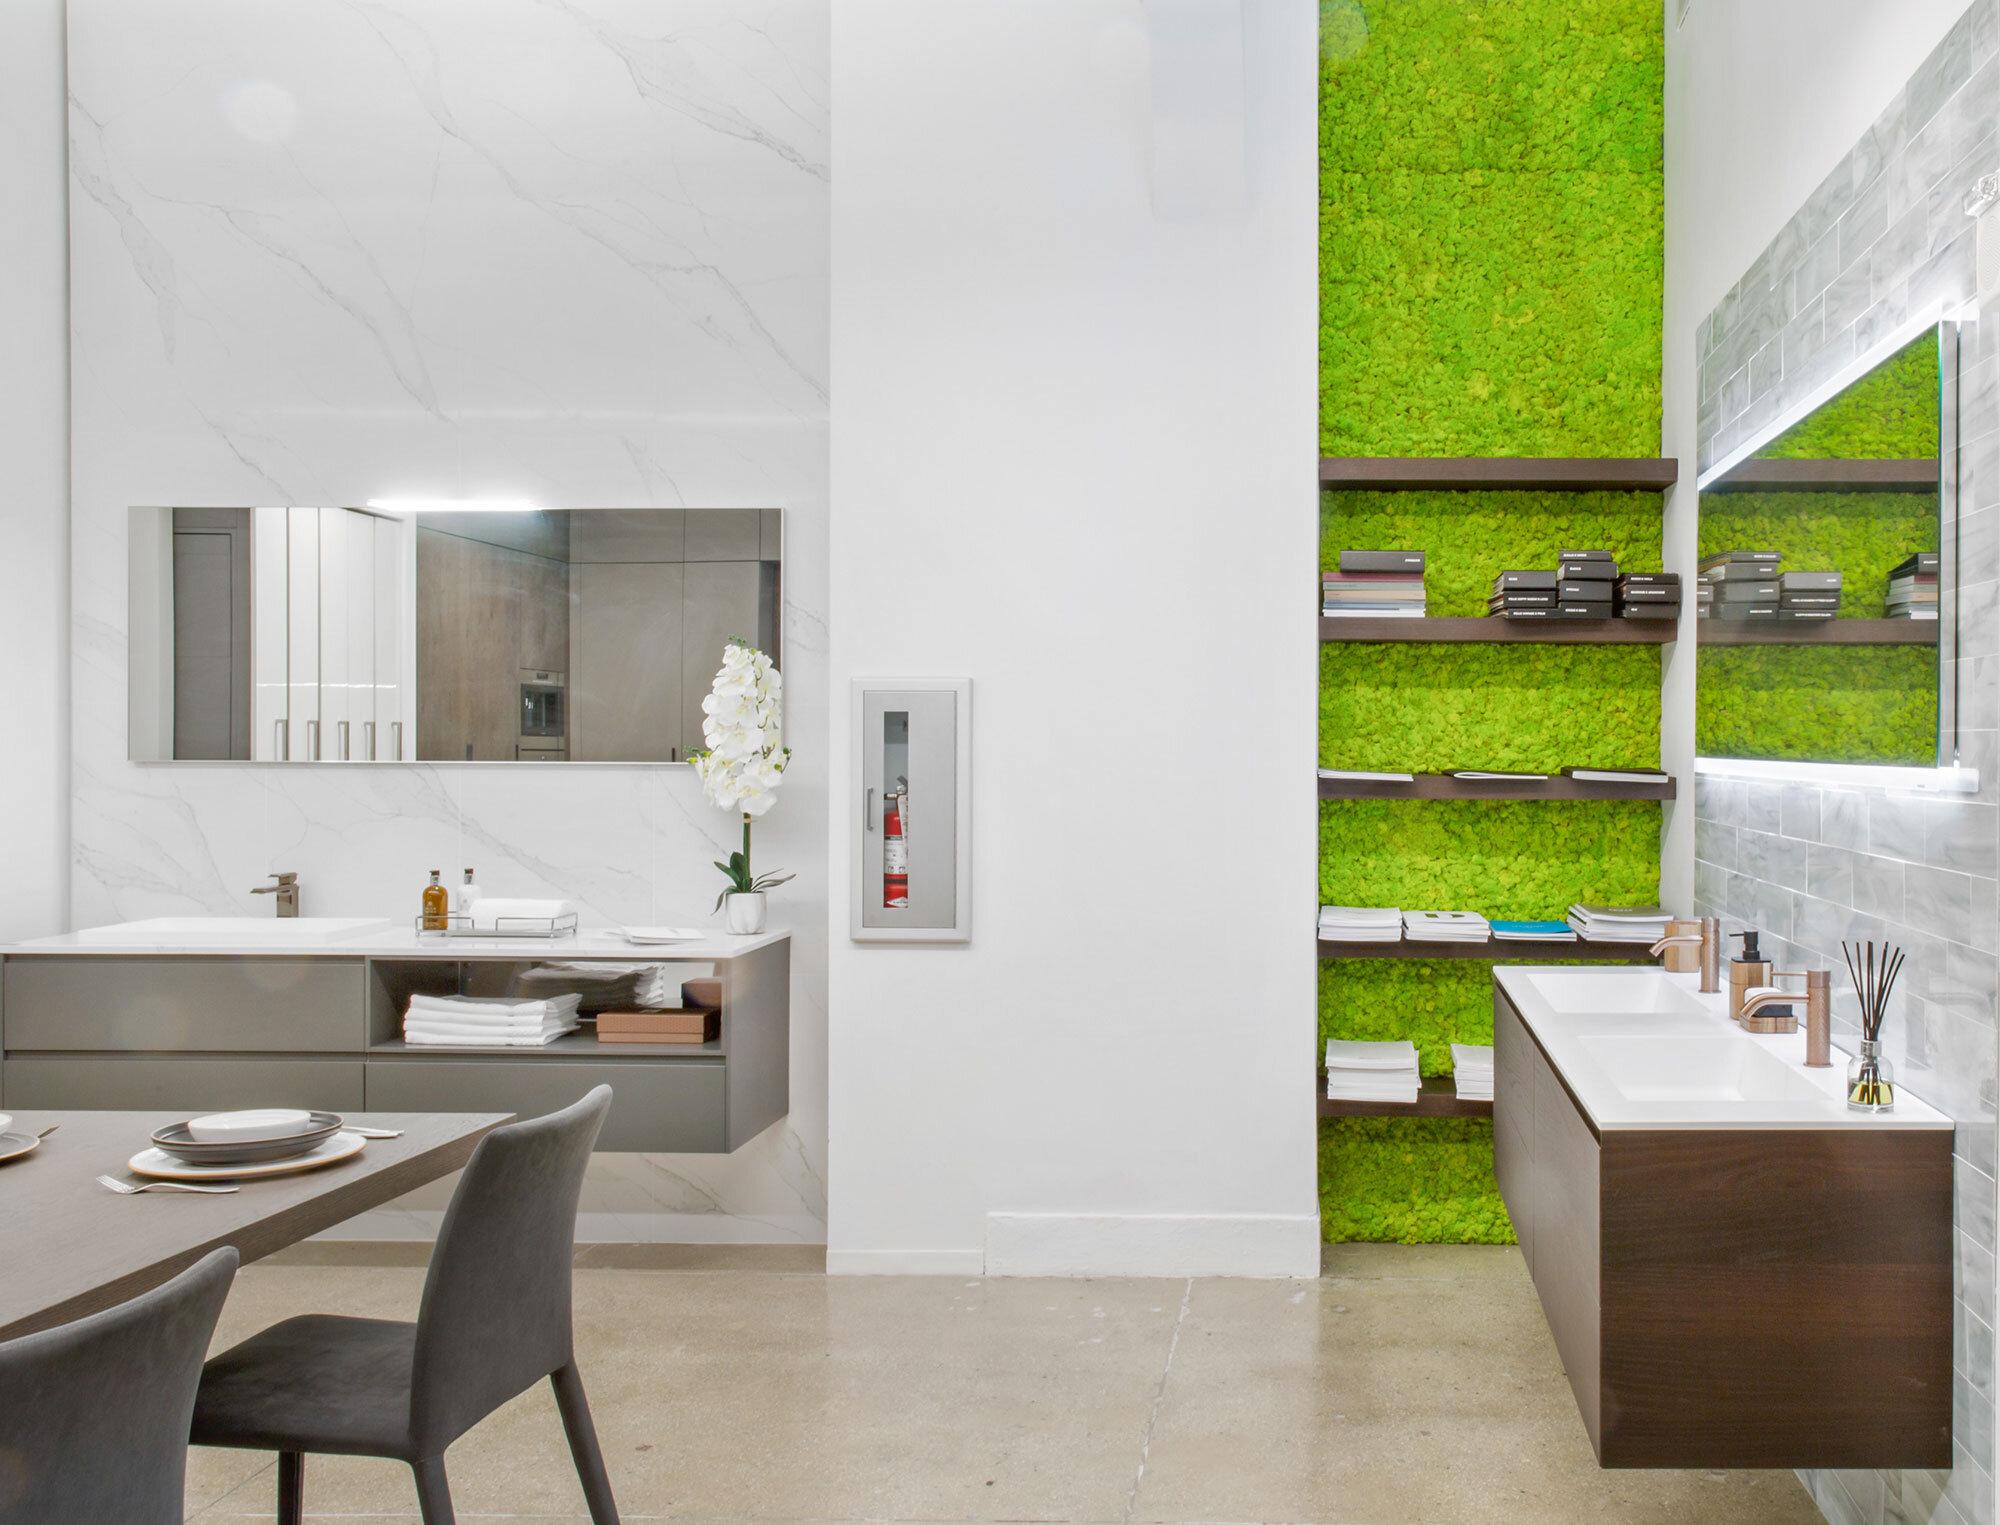 amusing kitchen showroom new york city   Modern kitchen and bath showroom   NYC — IRP Designs